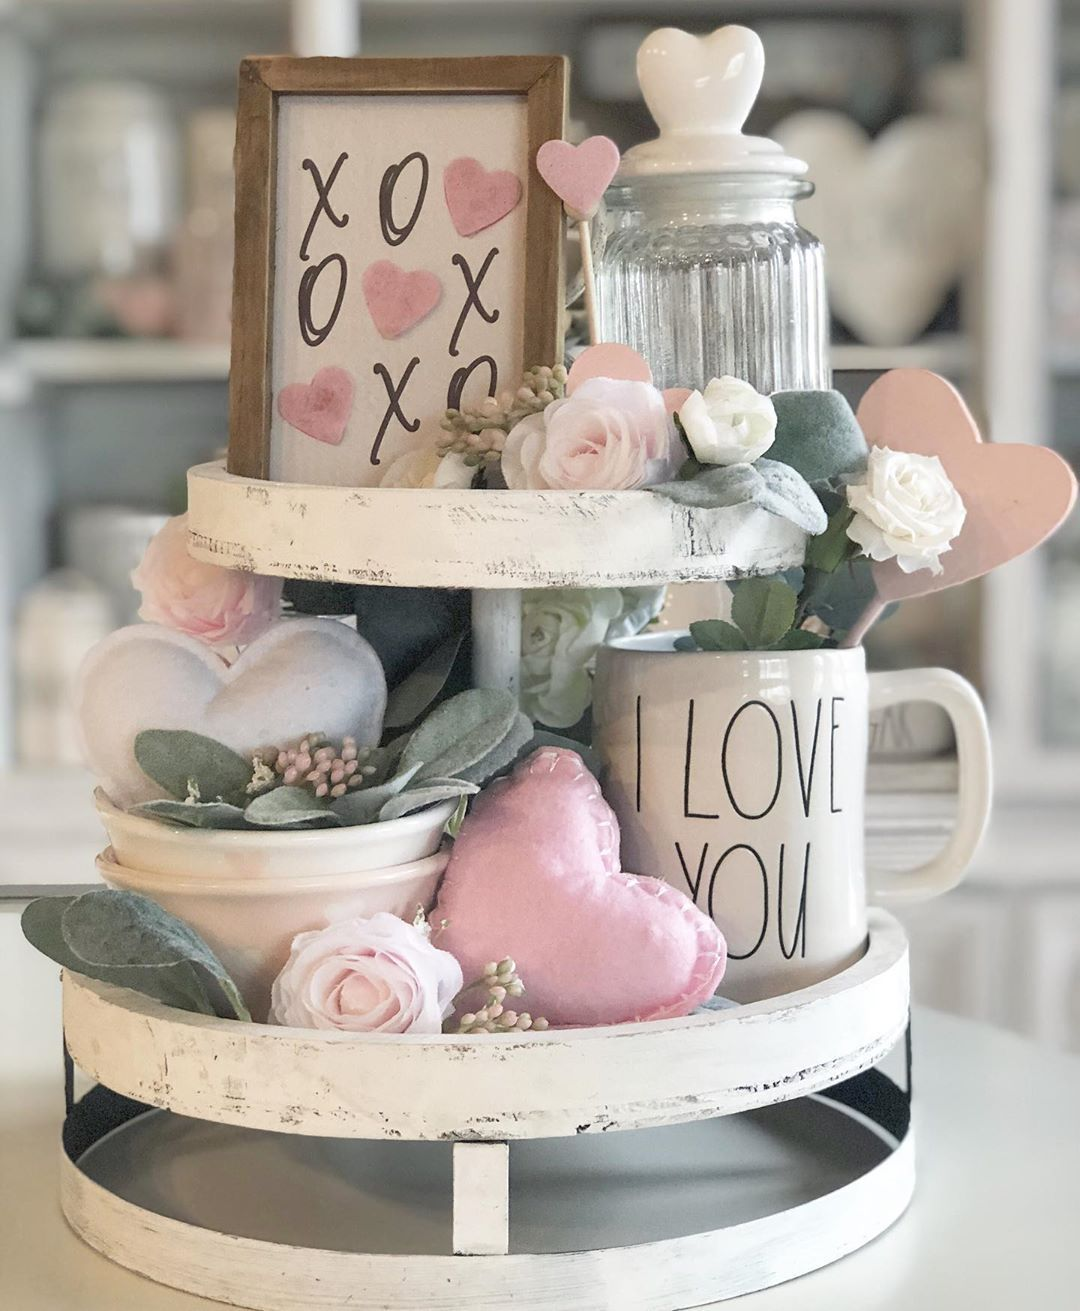 Abby Martinez On Instagram Love You Xoxo Tiertraydecor Tiertray Tiertrays Rae Diy Valentines Decorations Tiered Tray Decor Farmhouse Valentine Decor